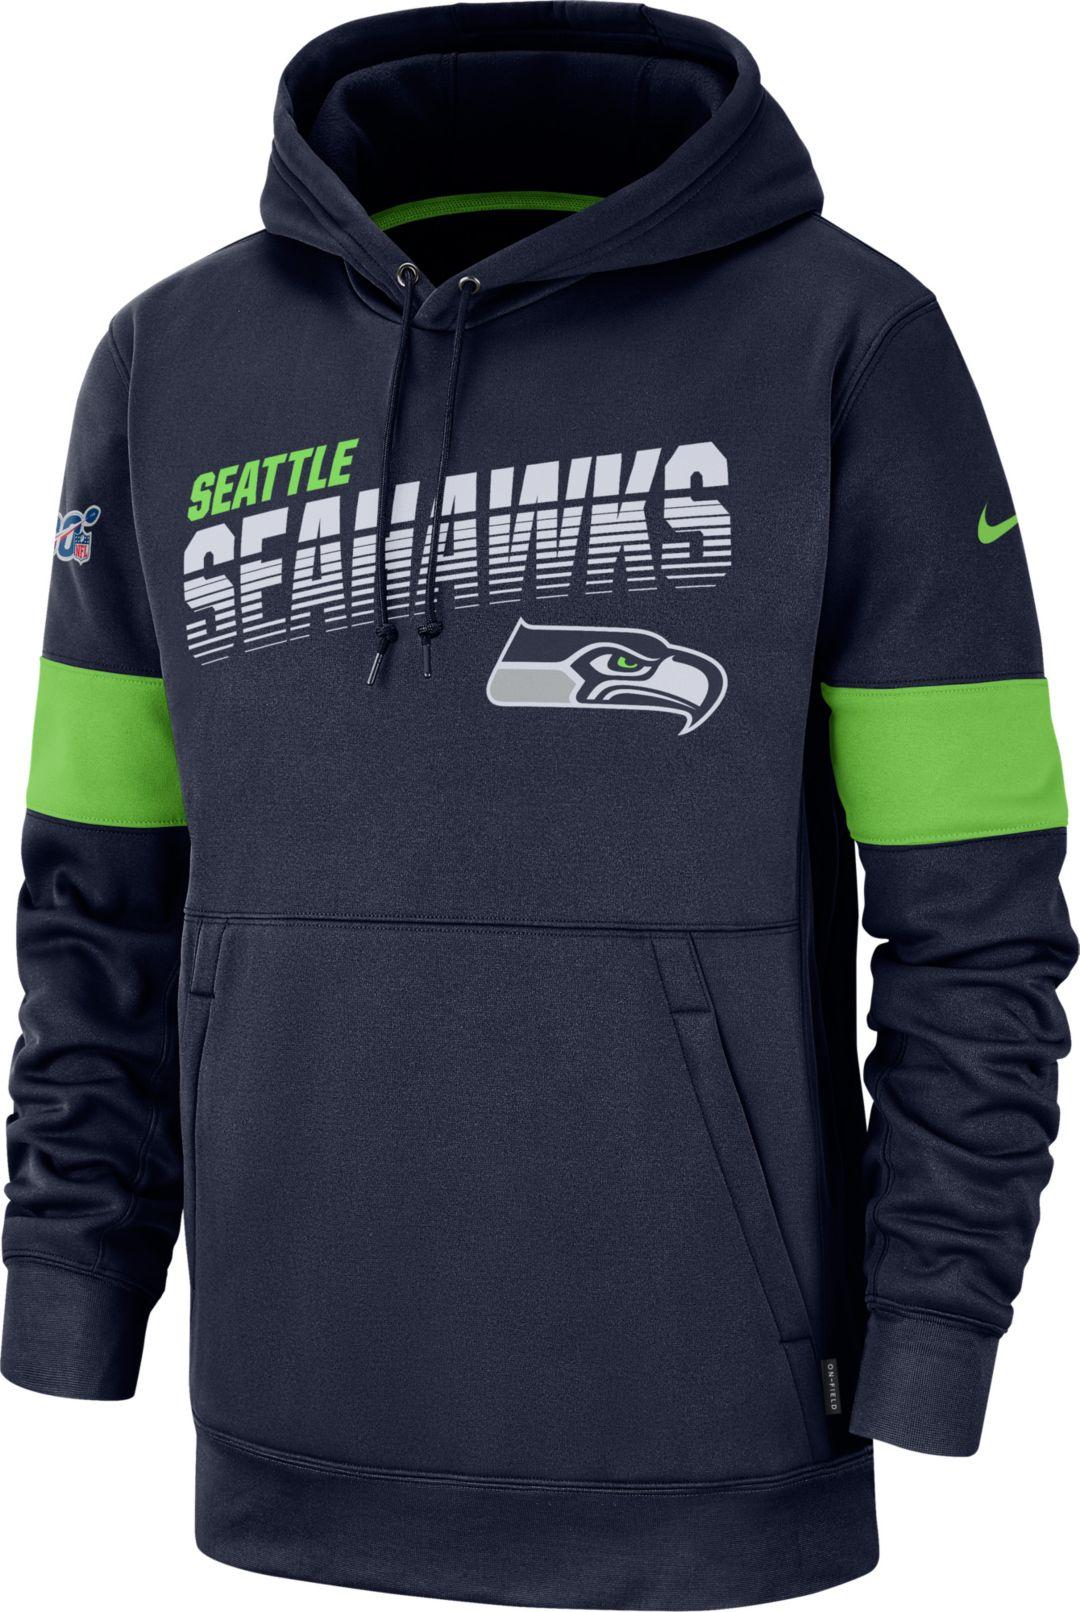 398853cf Nike Men's Seattle Seahawks 100th Sideline Therma-FIT Navy Pullover Hoodie